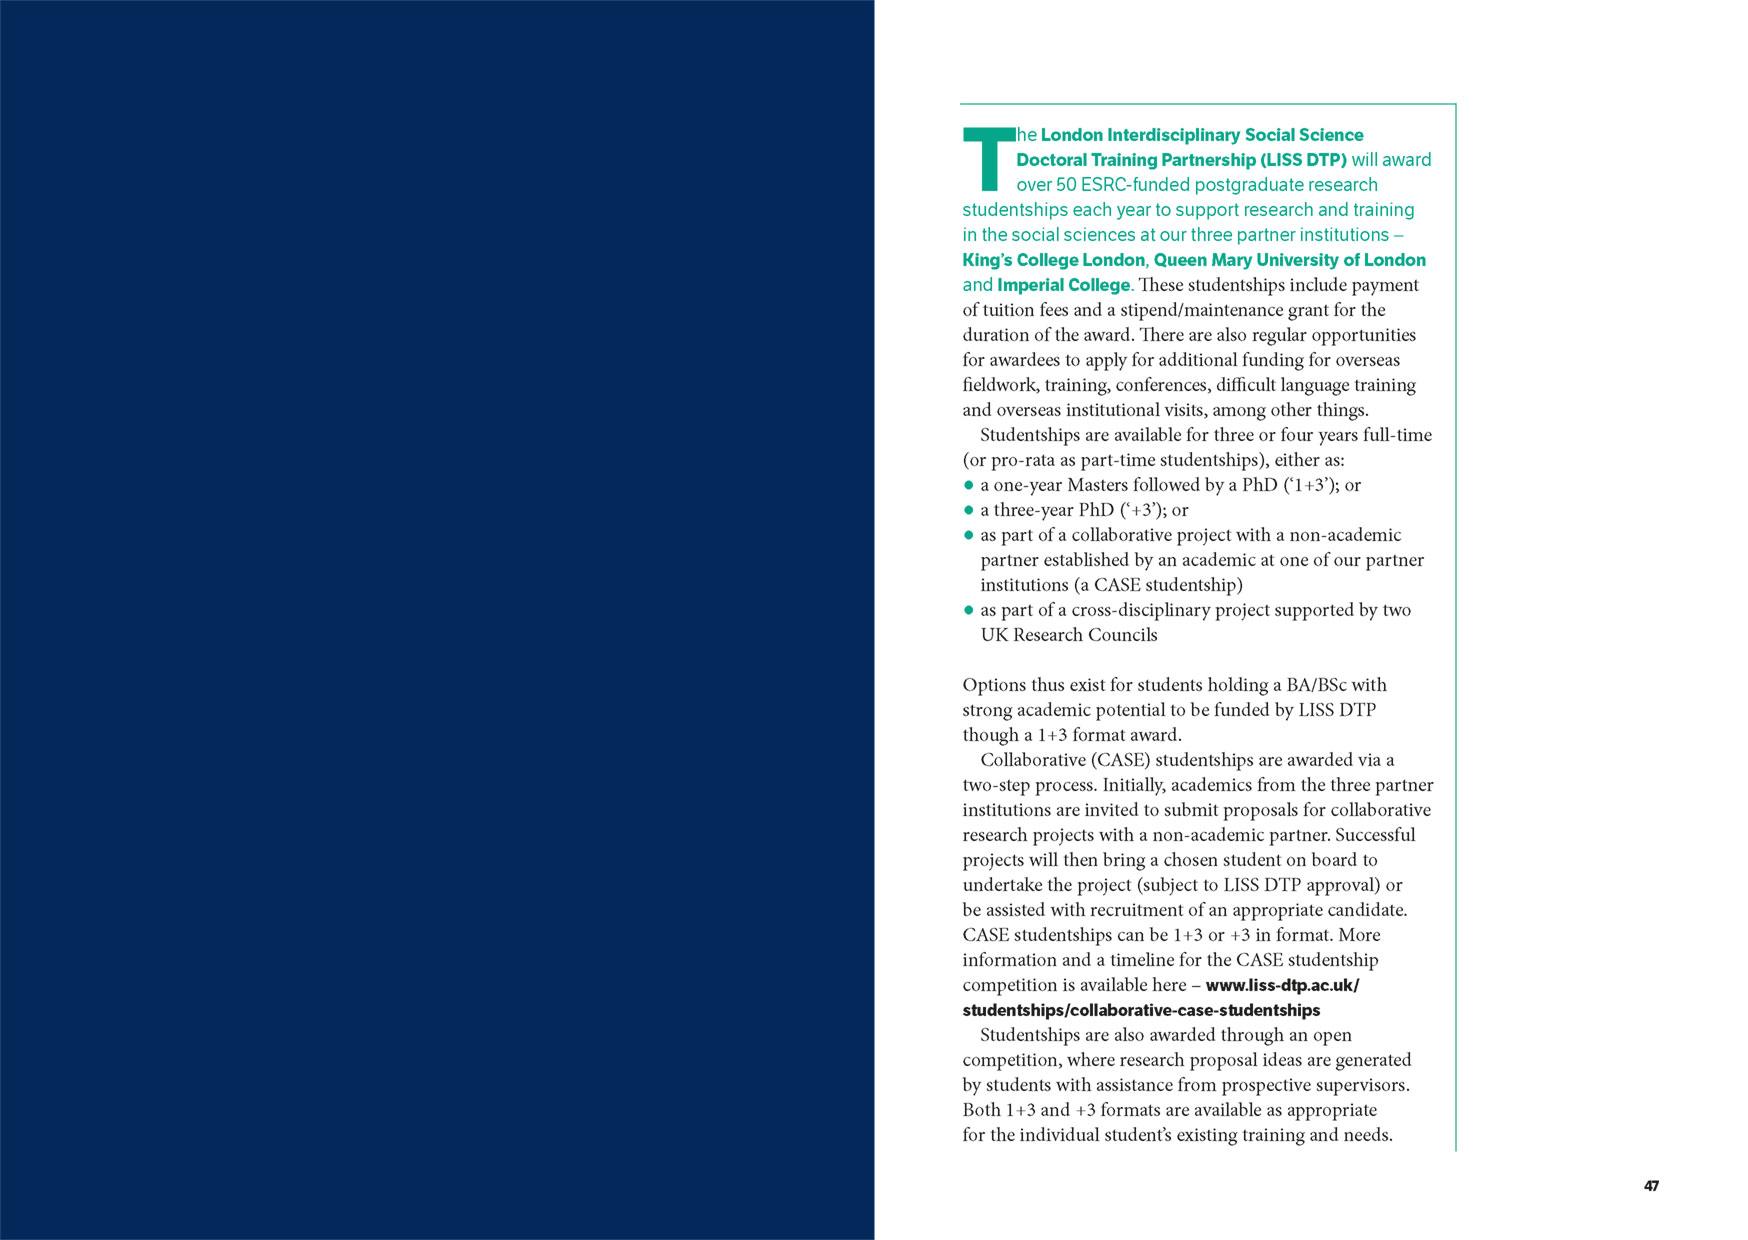 LISSDTP_Handbook_2018-19_ForWeb-25.jpg